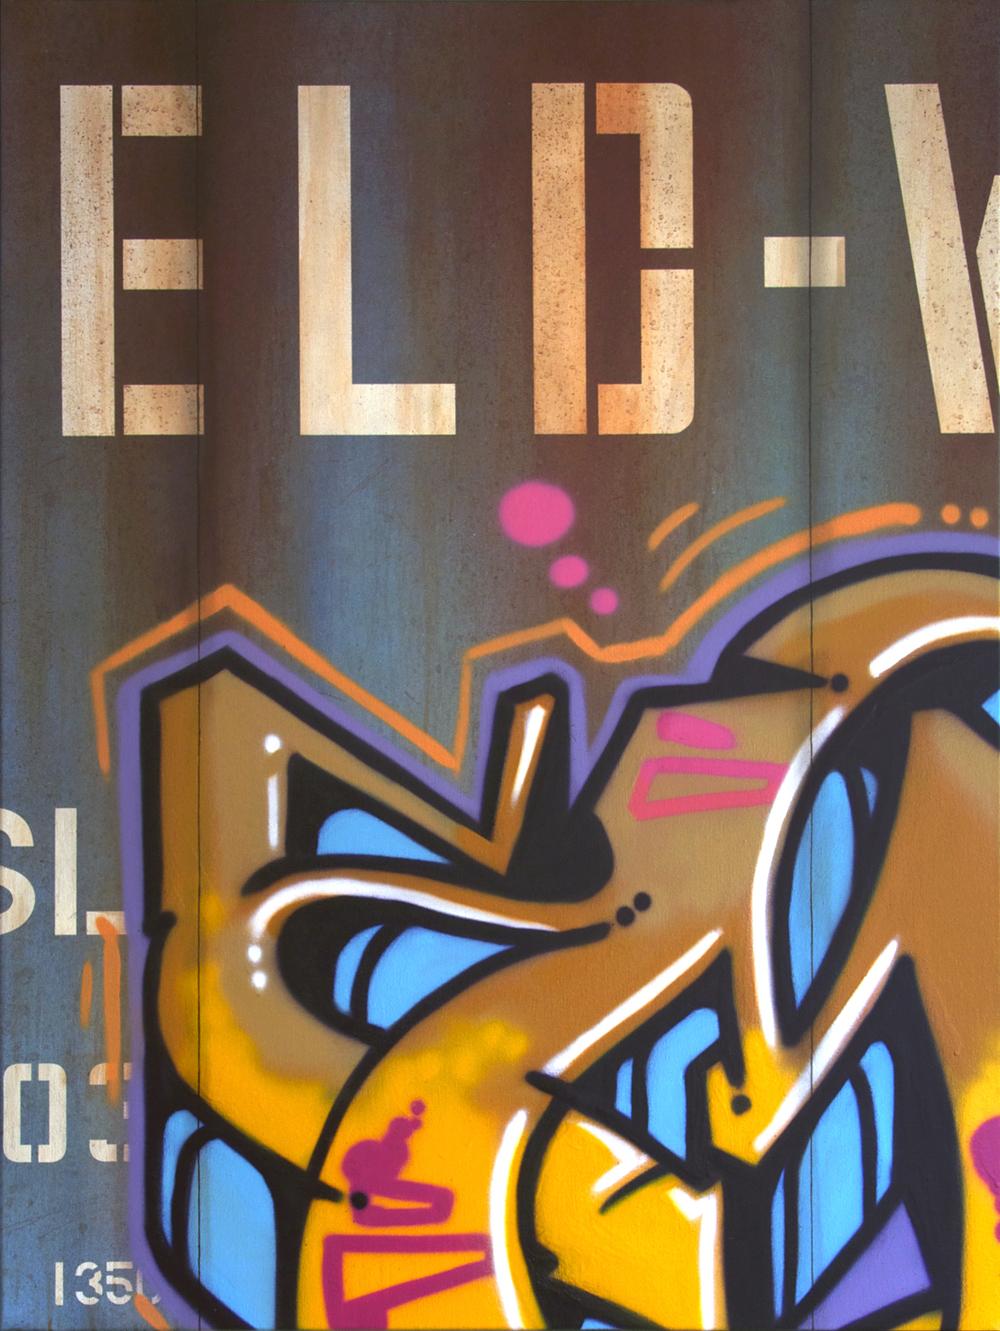 Blank Canvas #58 - JELD-WEN, Freight Train Painting, Boxcar Painting, Railroad Art, Tim Conlon Art